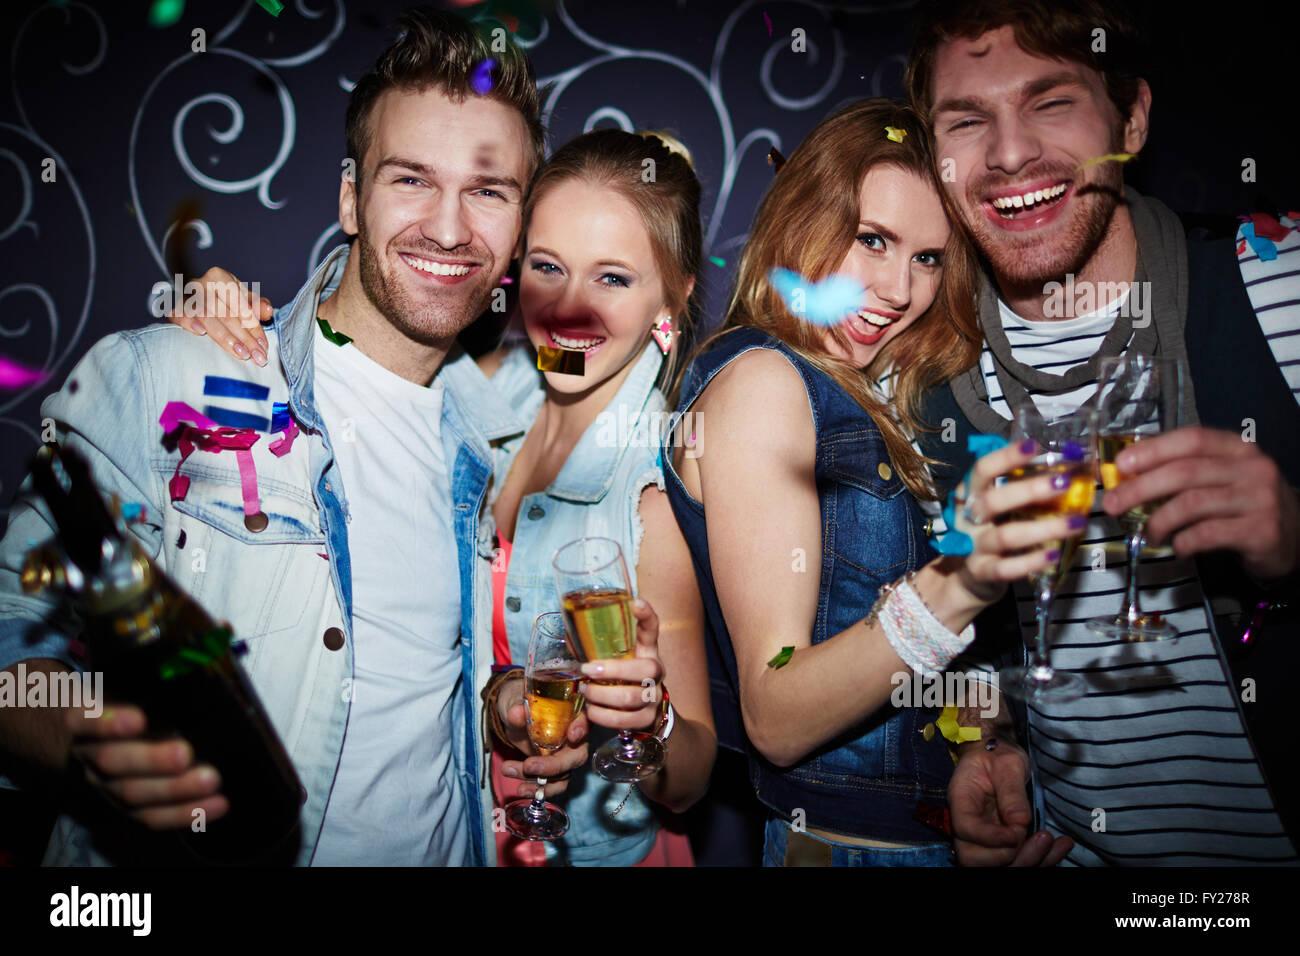 Noche clubbers con champán Imagen De Stock